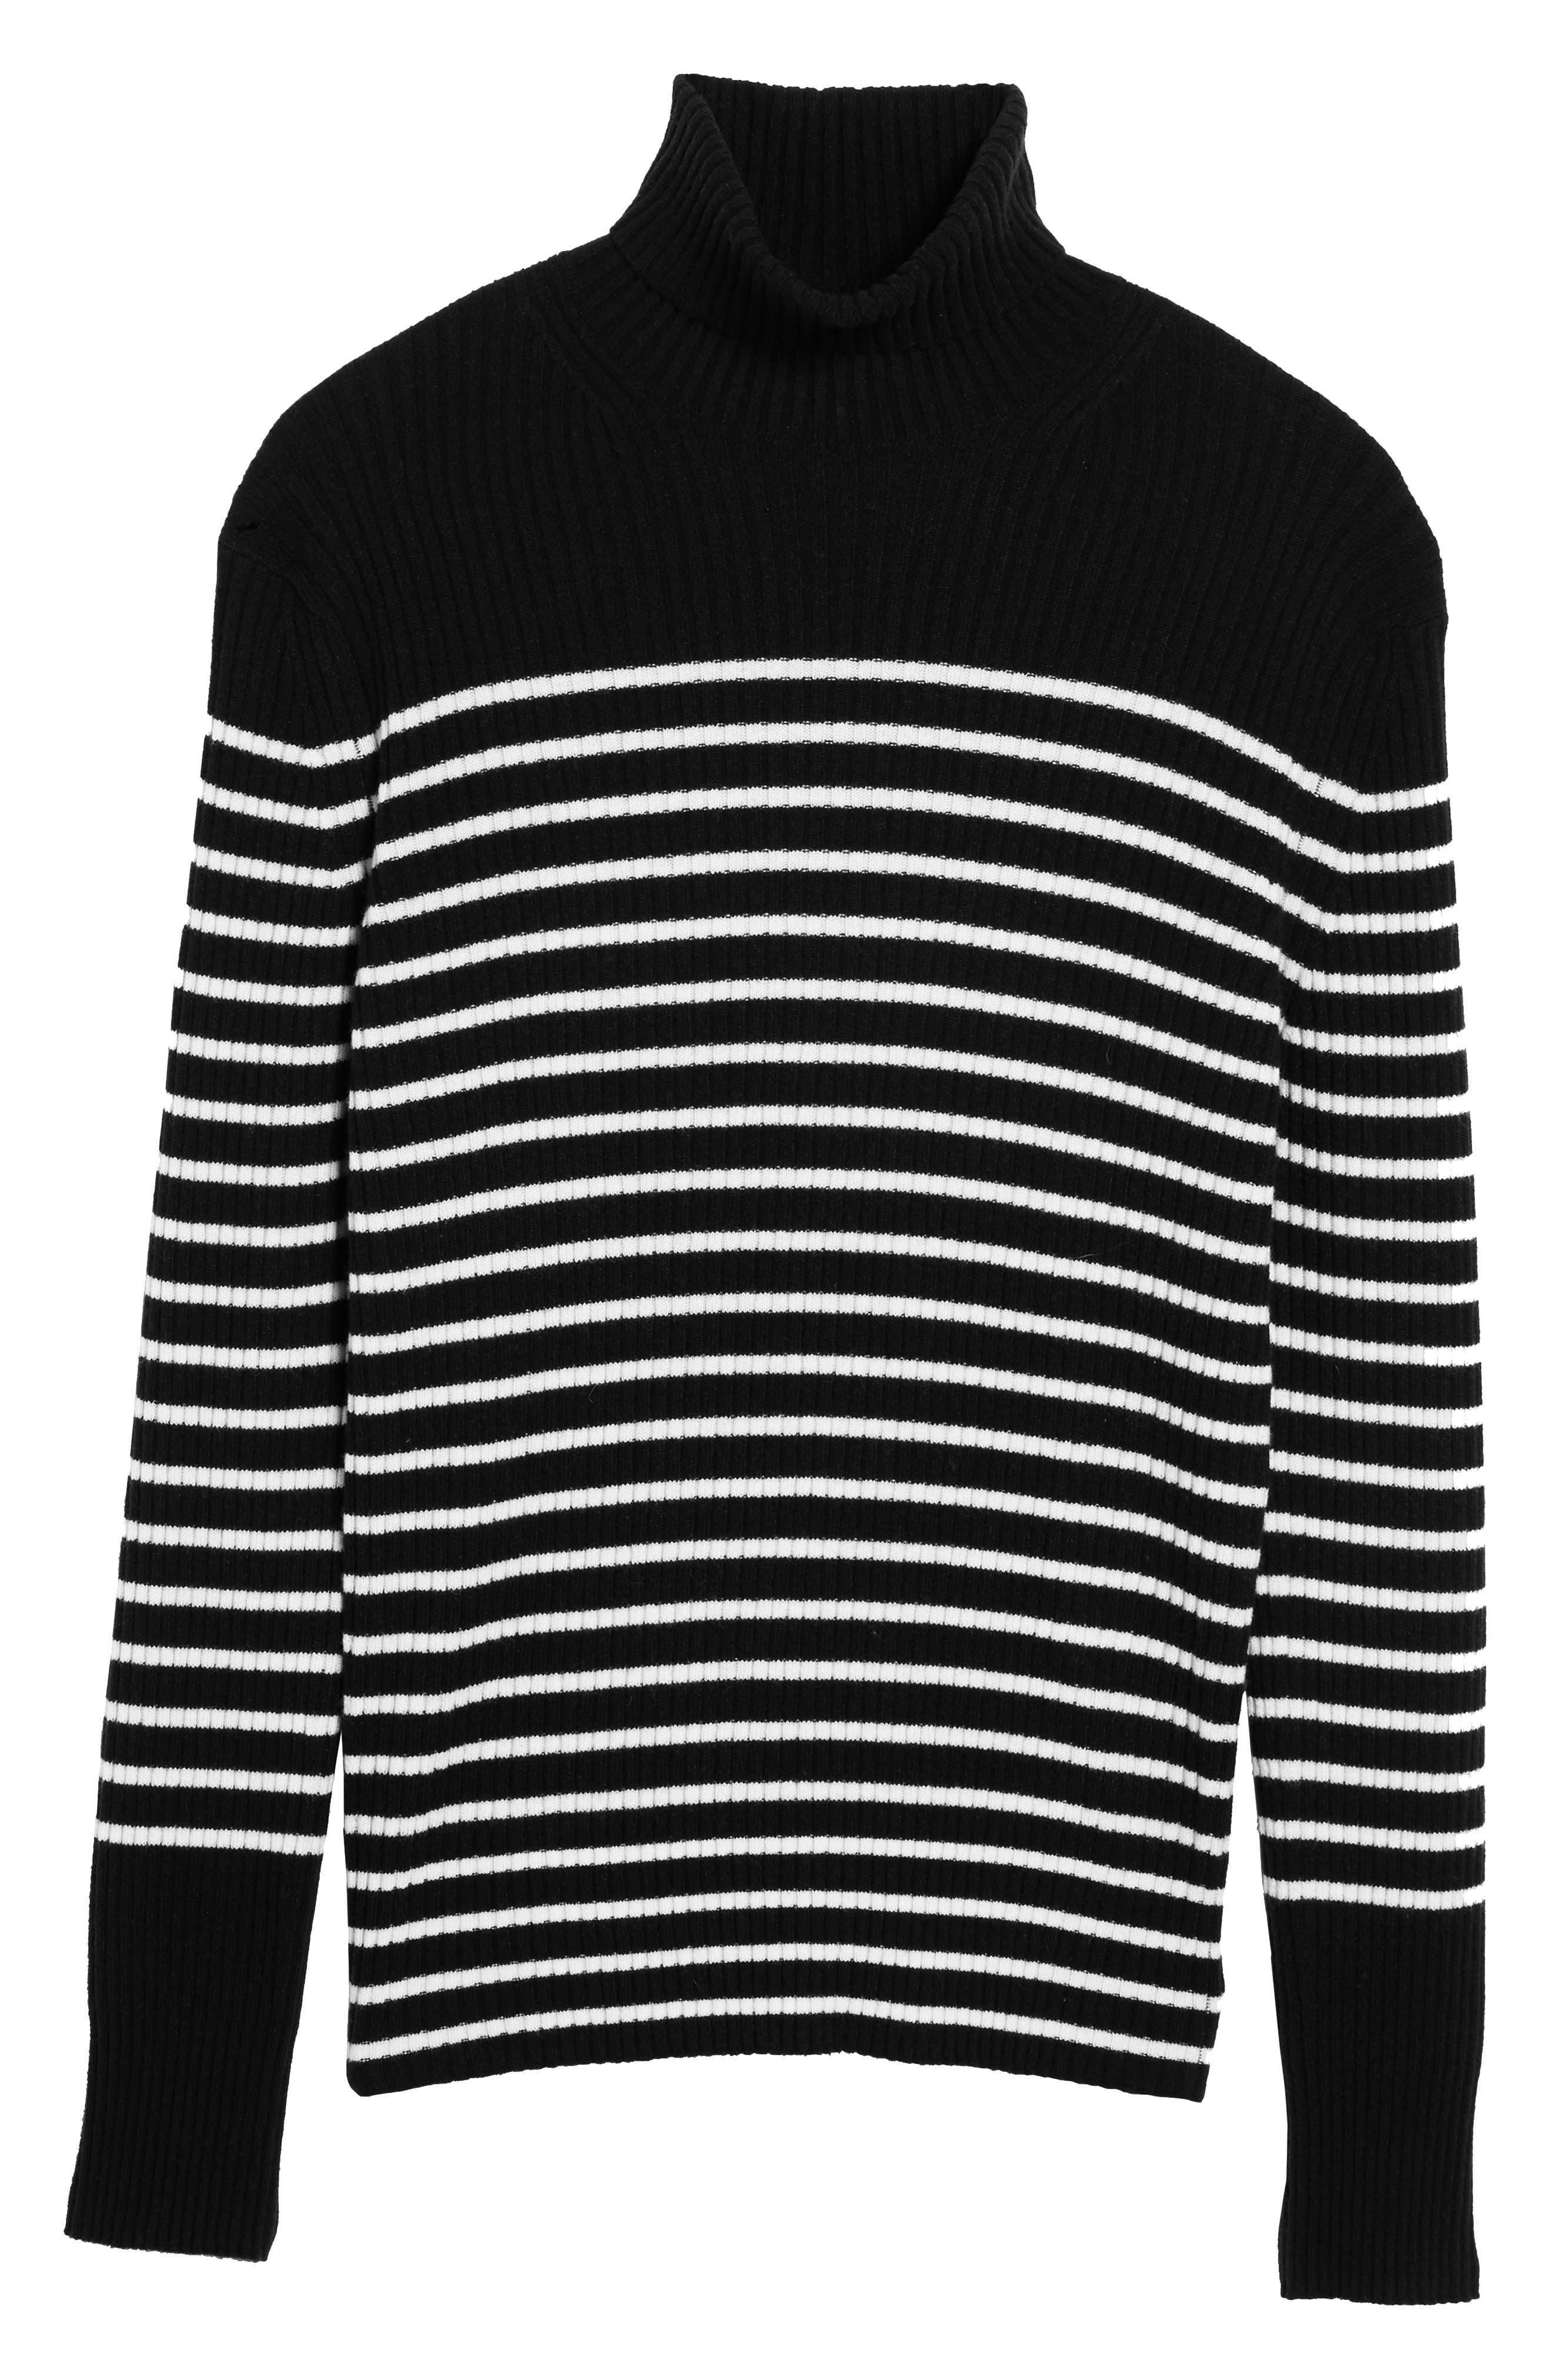 Regular Fit Breton Stripe Cashmere Turtleneck Sweater,                             Alternate thumbnail 12, color,